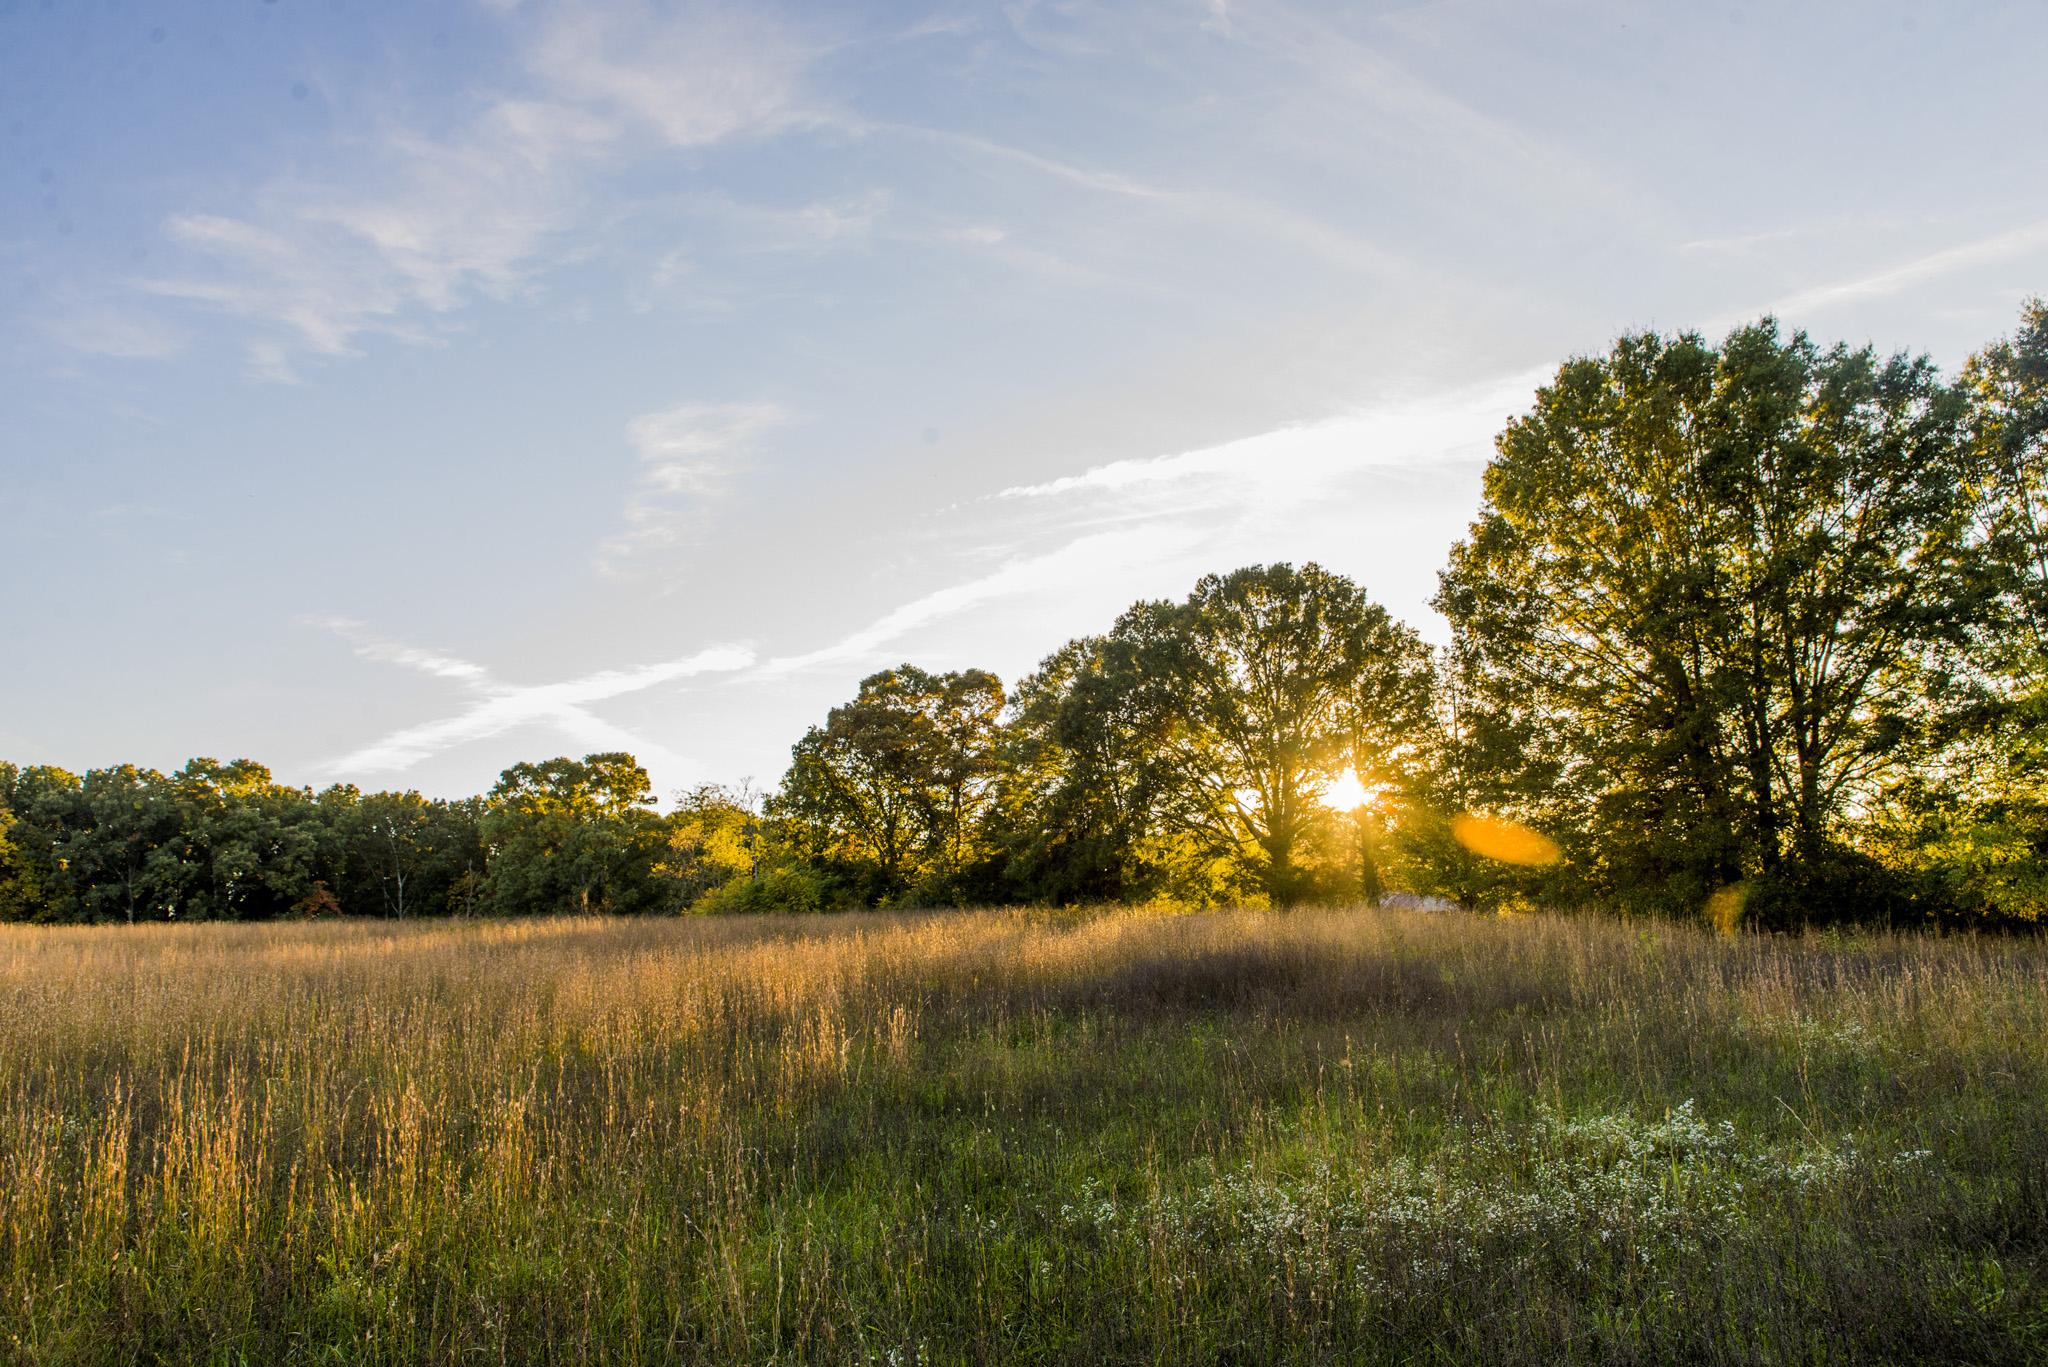 field_barn_engagement_session_sunset_golden_romantic_rustic_lynchburg_va035.jpg